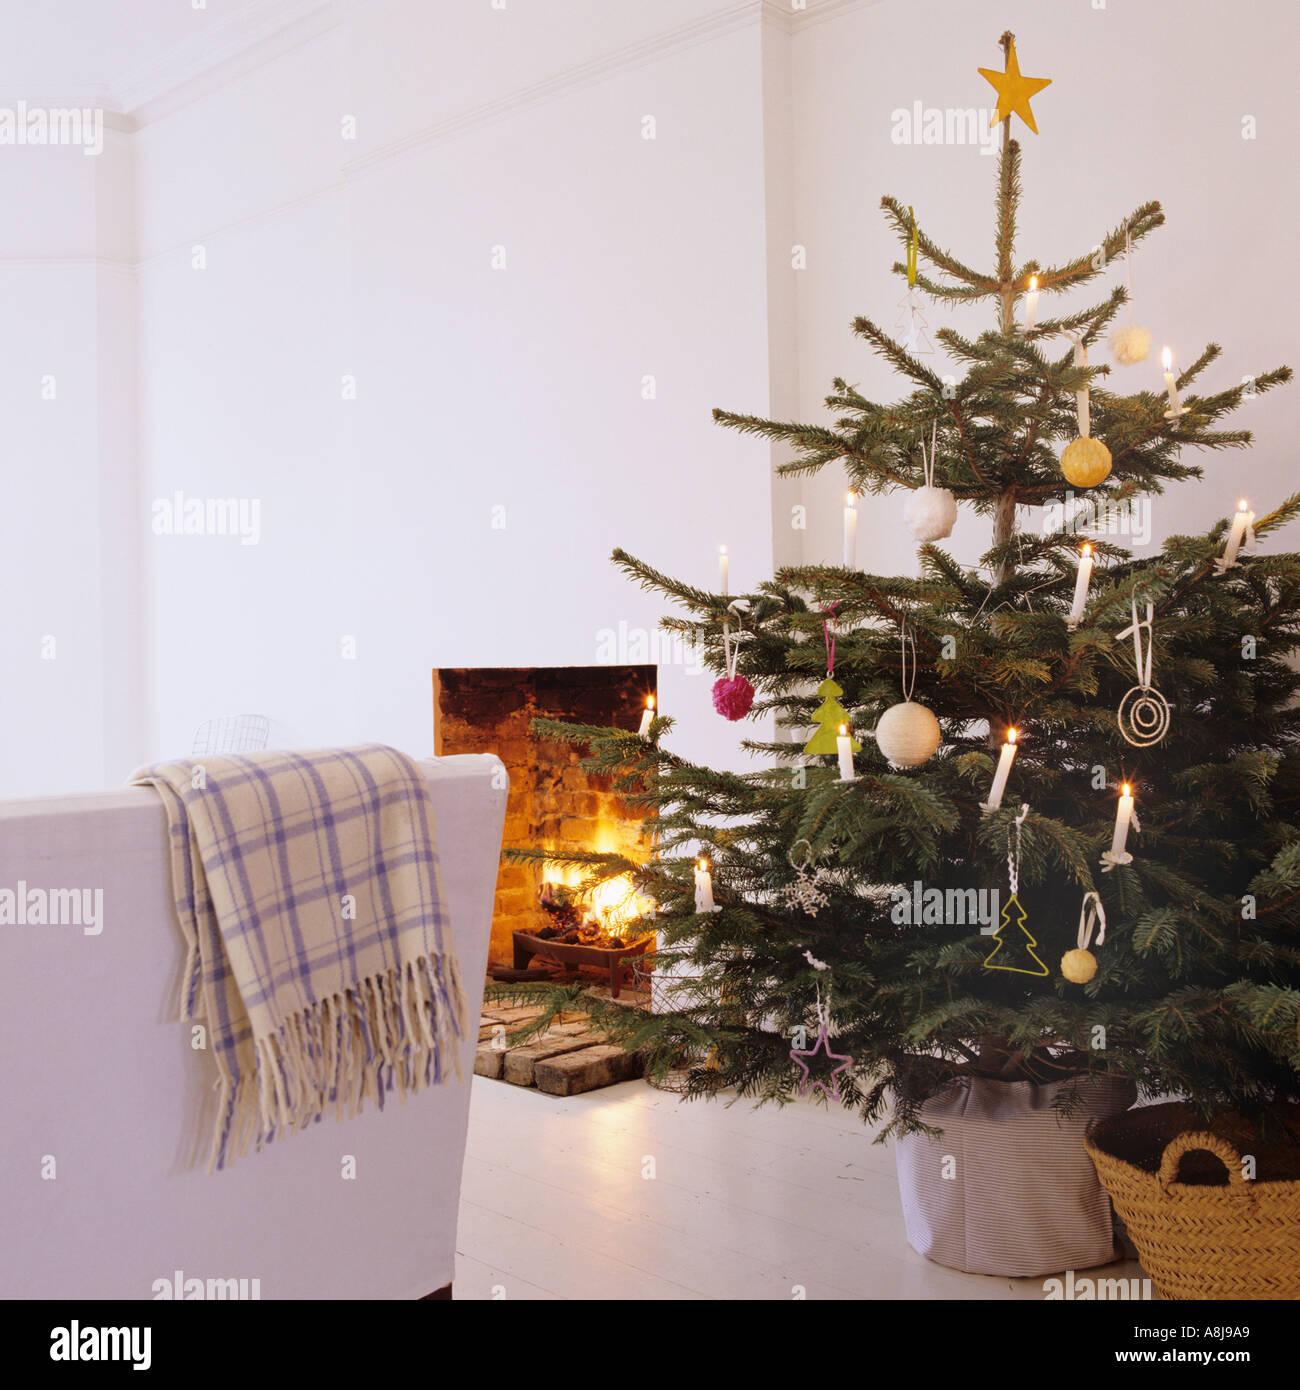 Moderner Weihnachtsbaum.Moderner Weihnachtsbaum Stockfotos Moderner Weihnachtsbaum